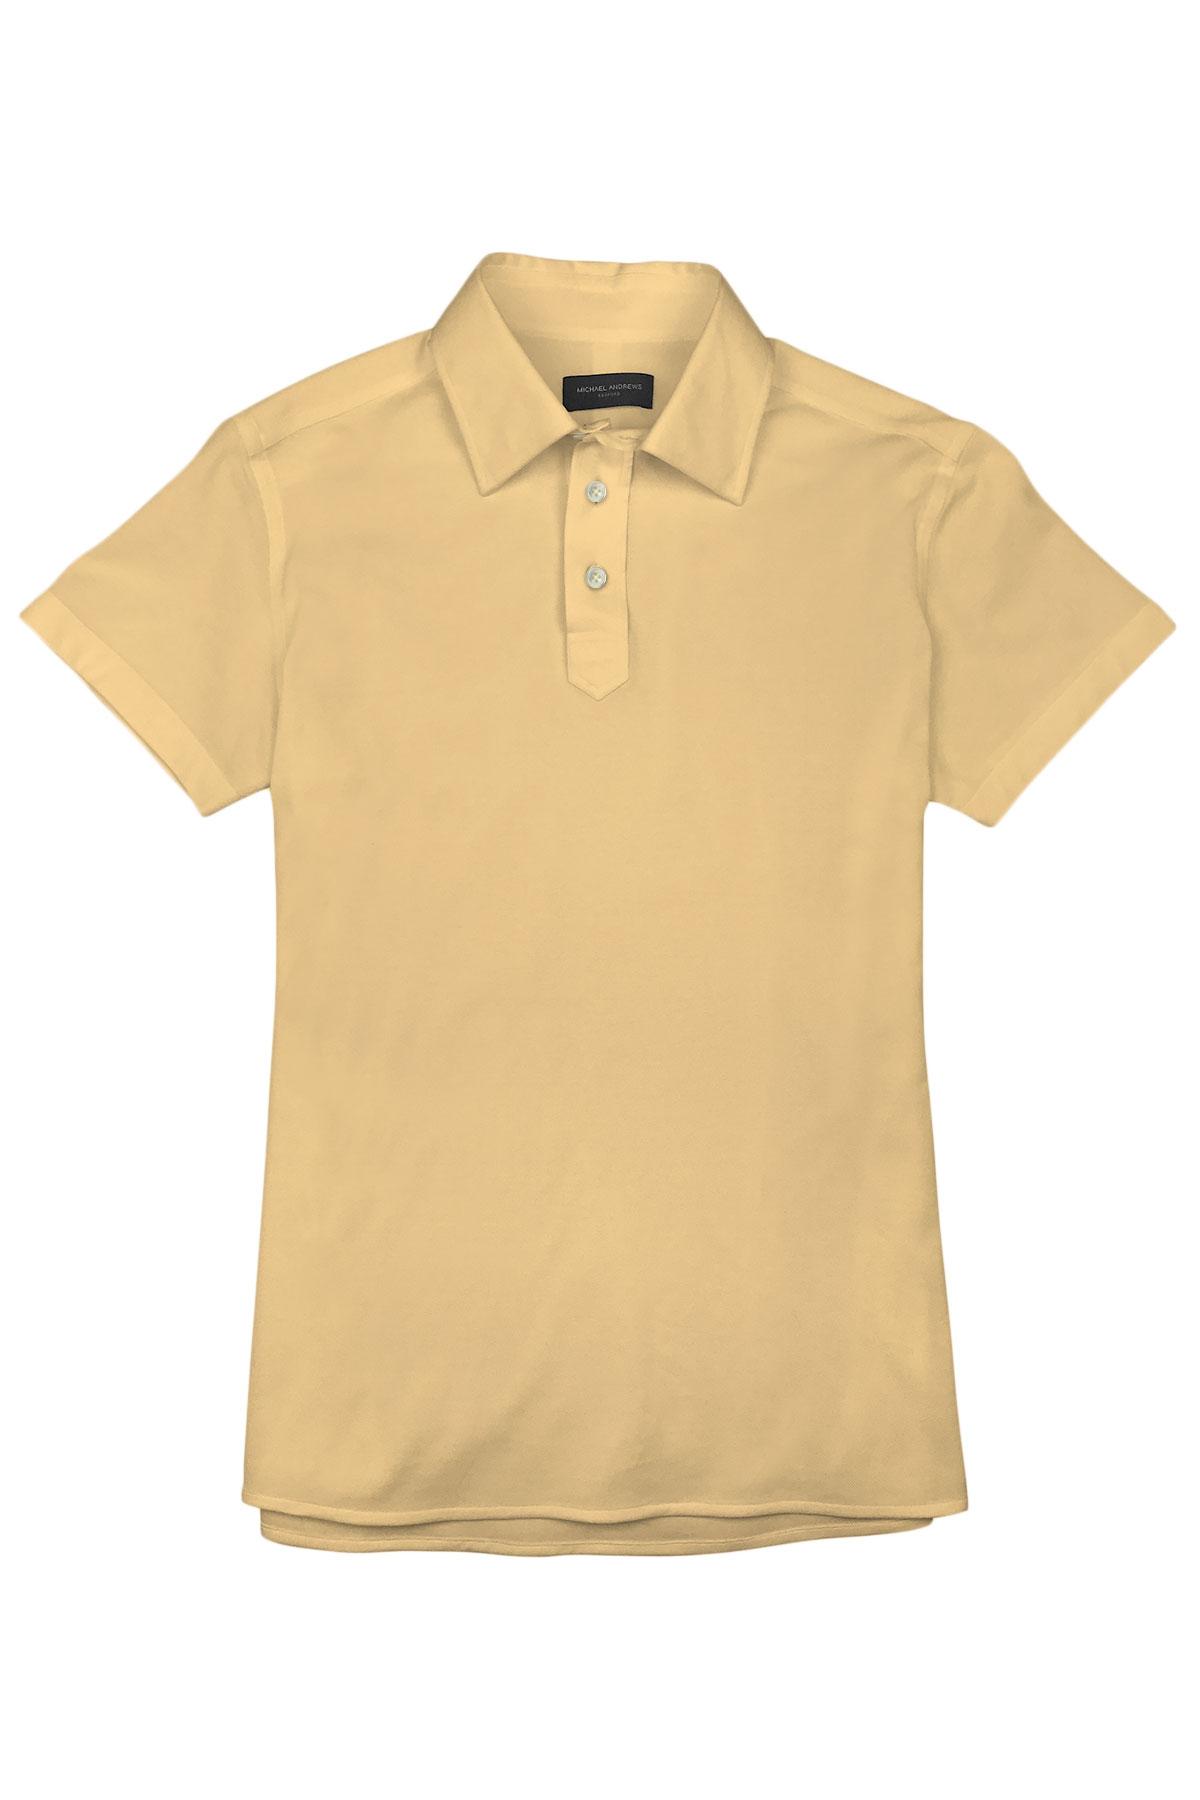 Pale Yellow Pique Polo Shirt